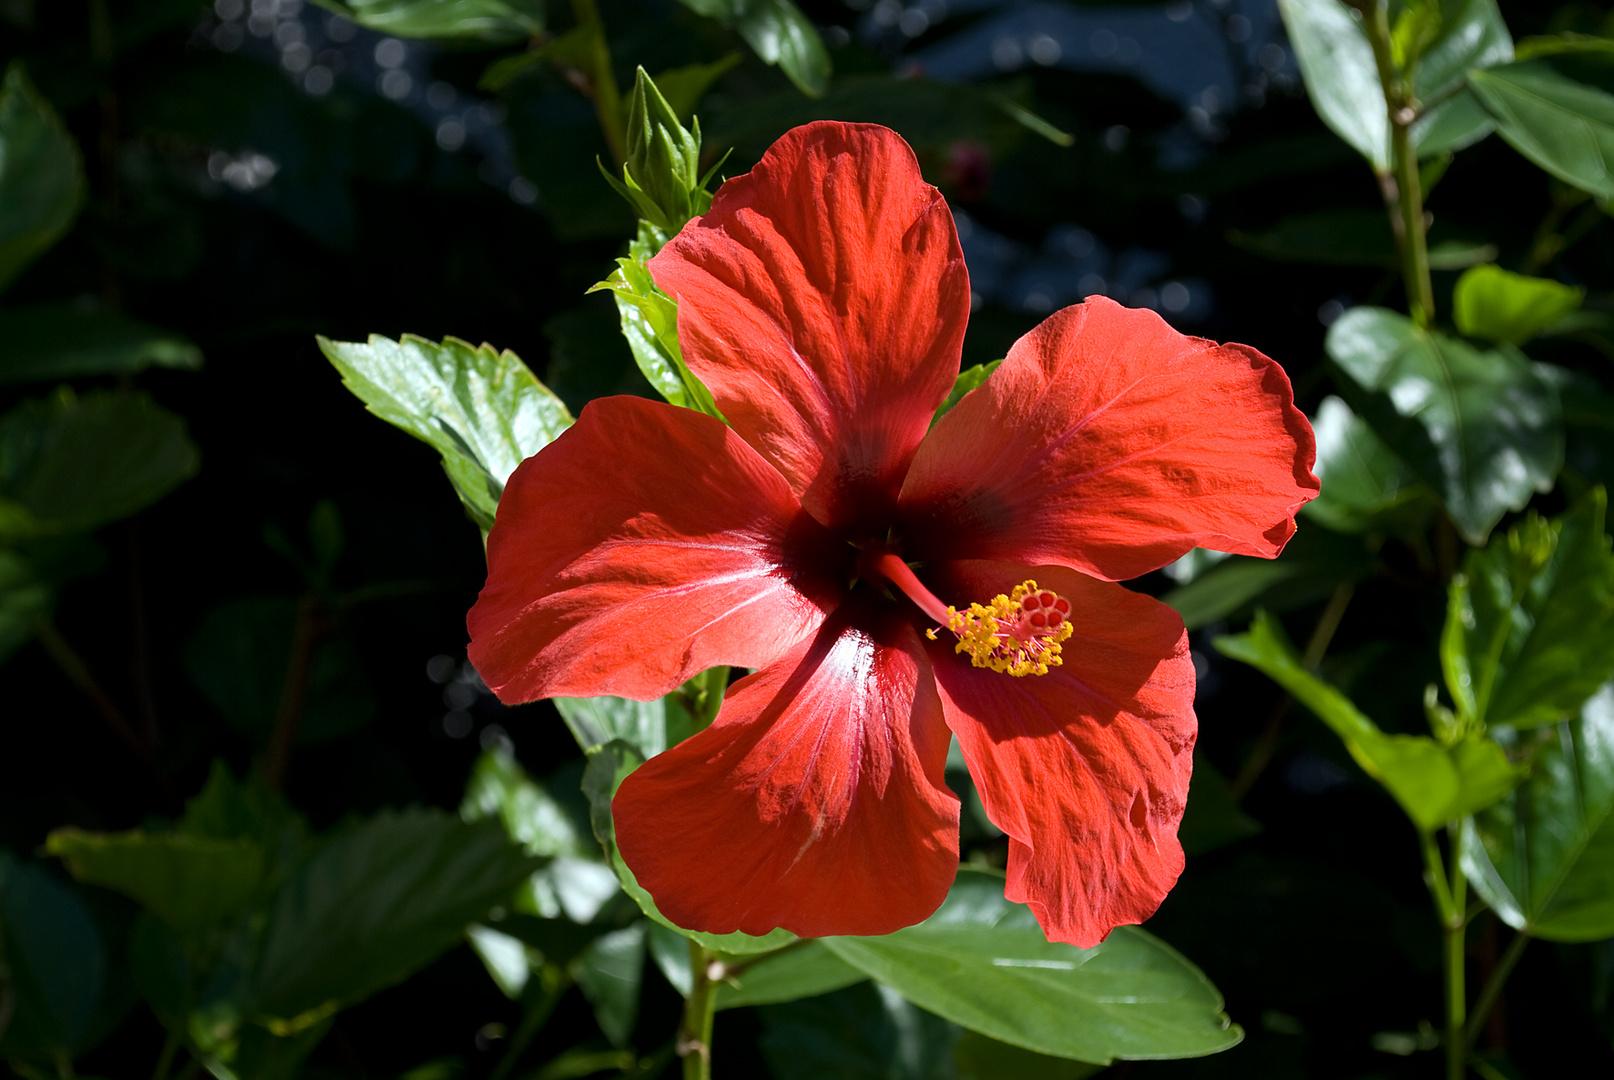 rote hibiskus in spanien foto bild pflanzen pilze flechten bl ten kleinpflanzen. Black Bedroom Furniture Sets. Home Design Ideas